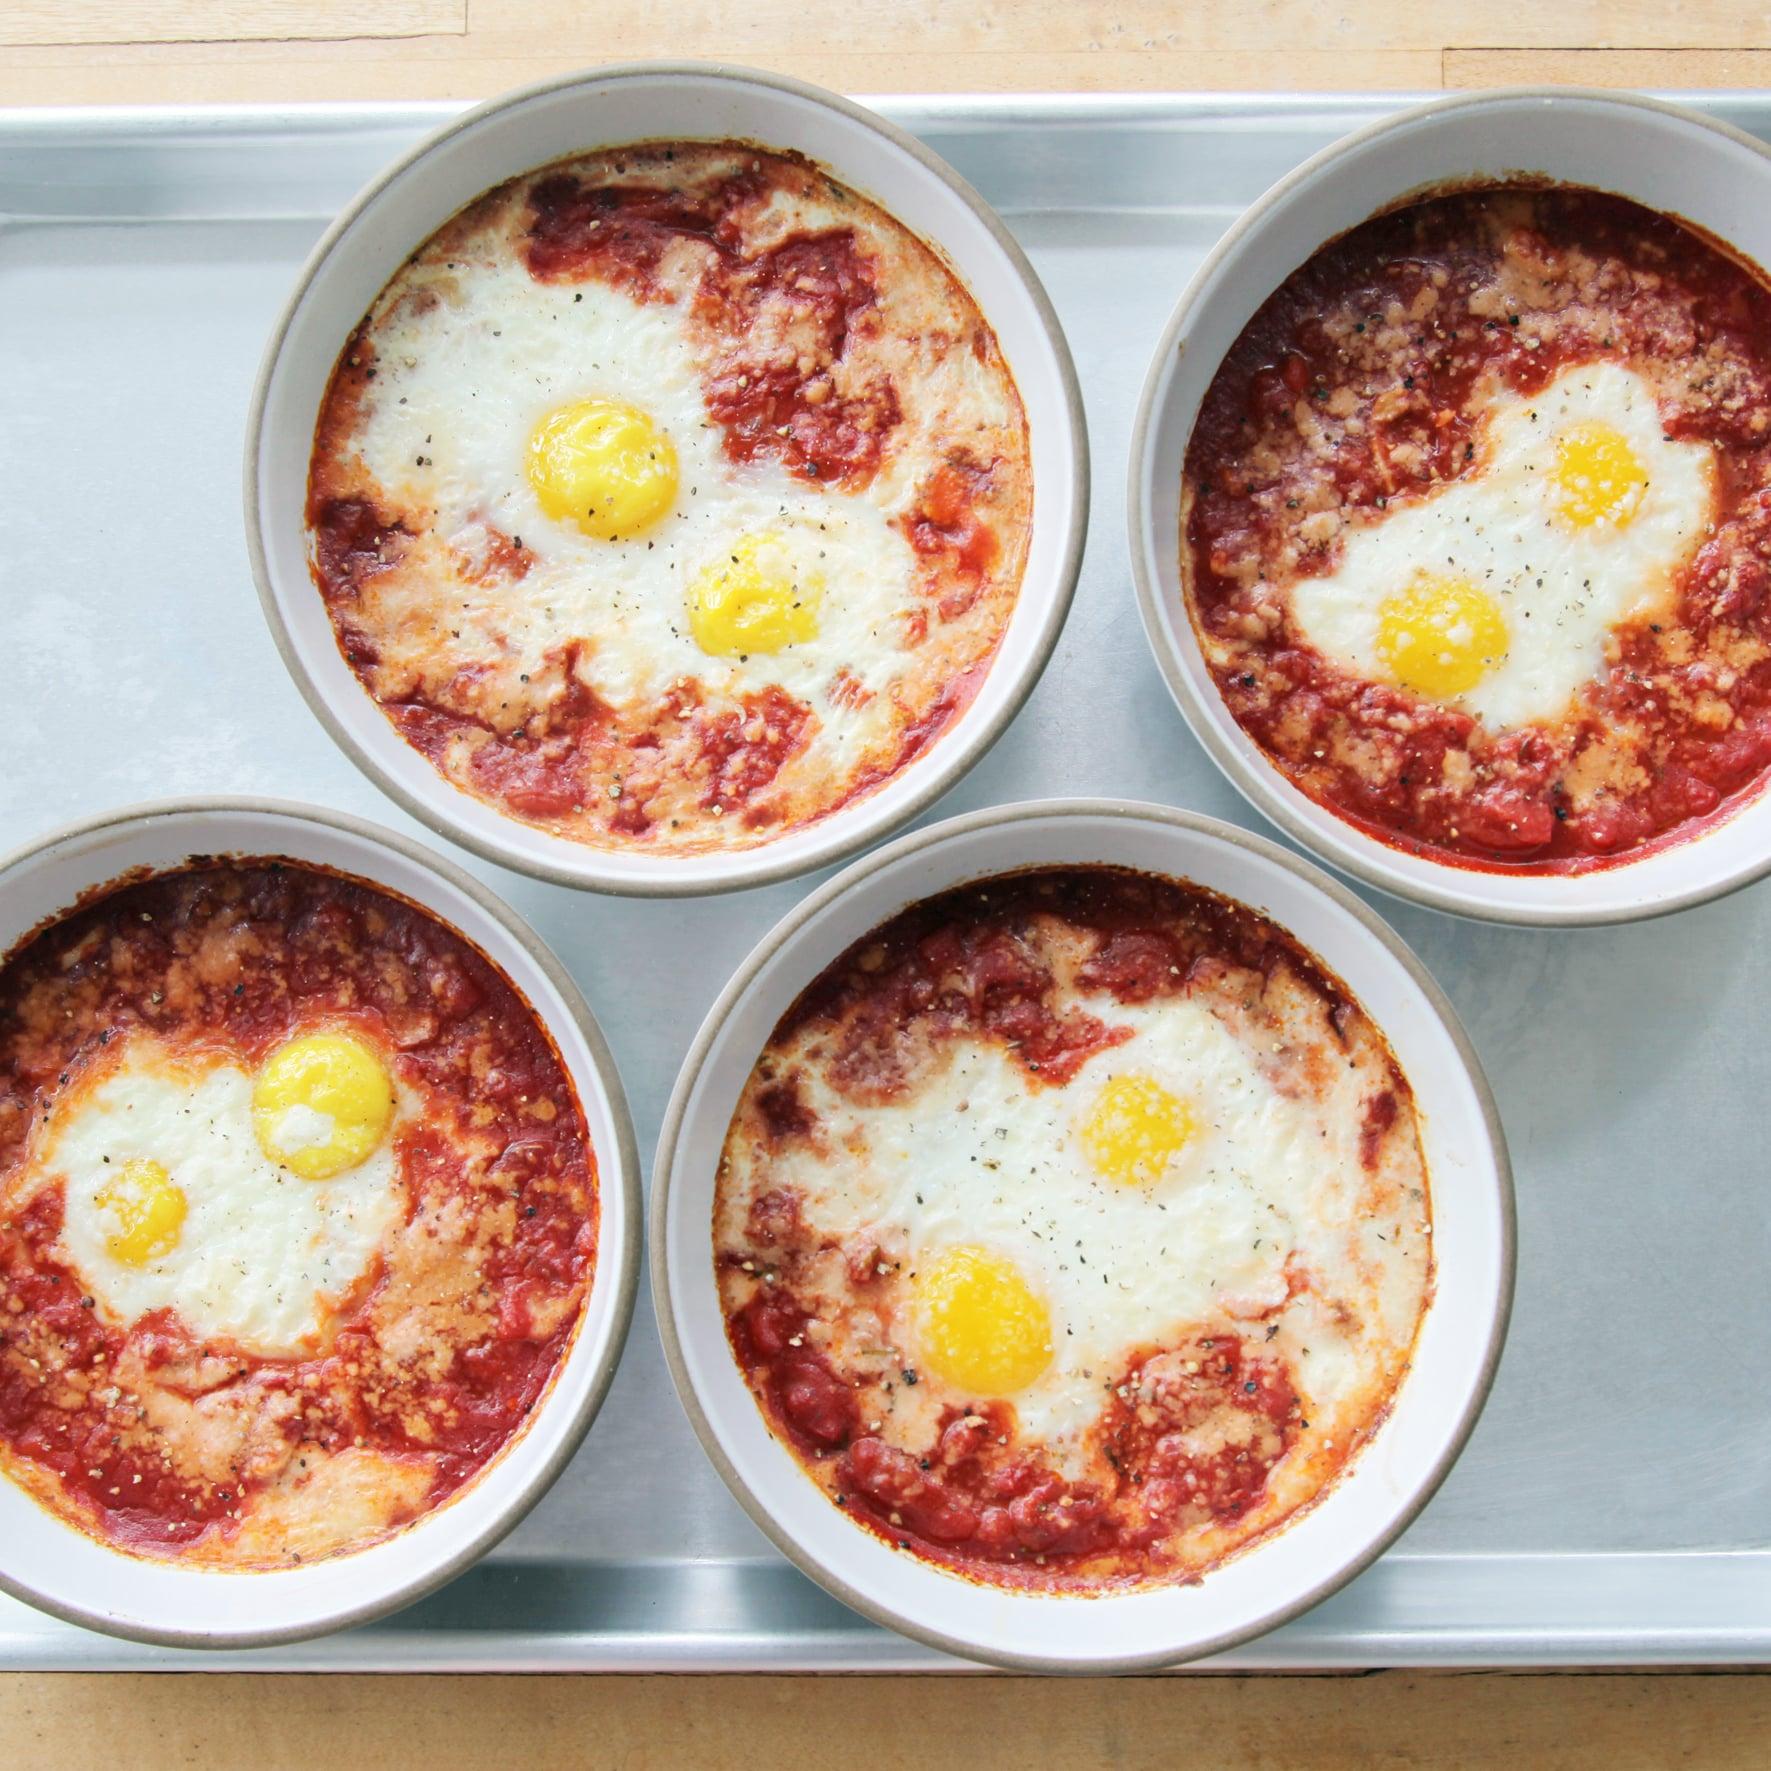 Easy egg recipes for breakfast popsugar food forumfinder Image collections